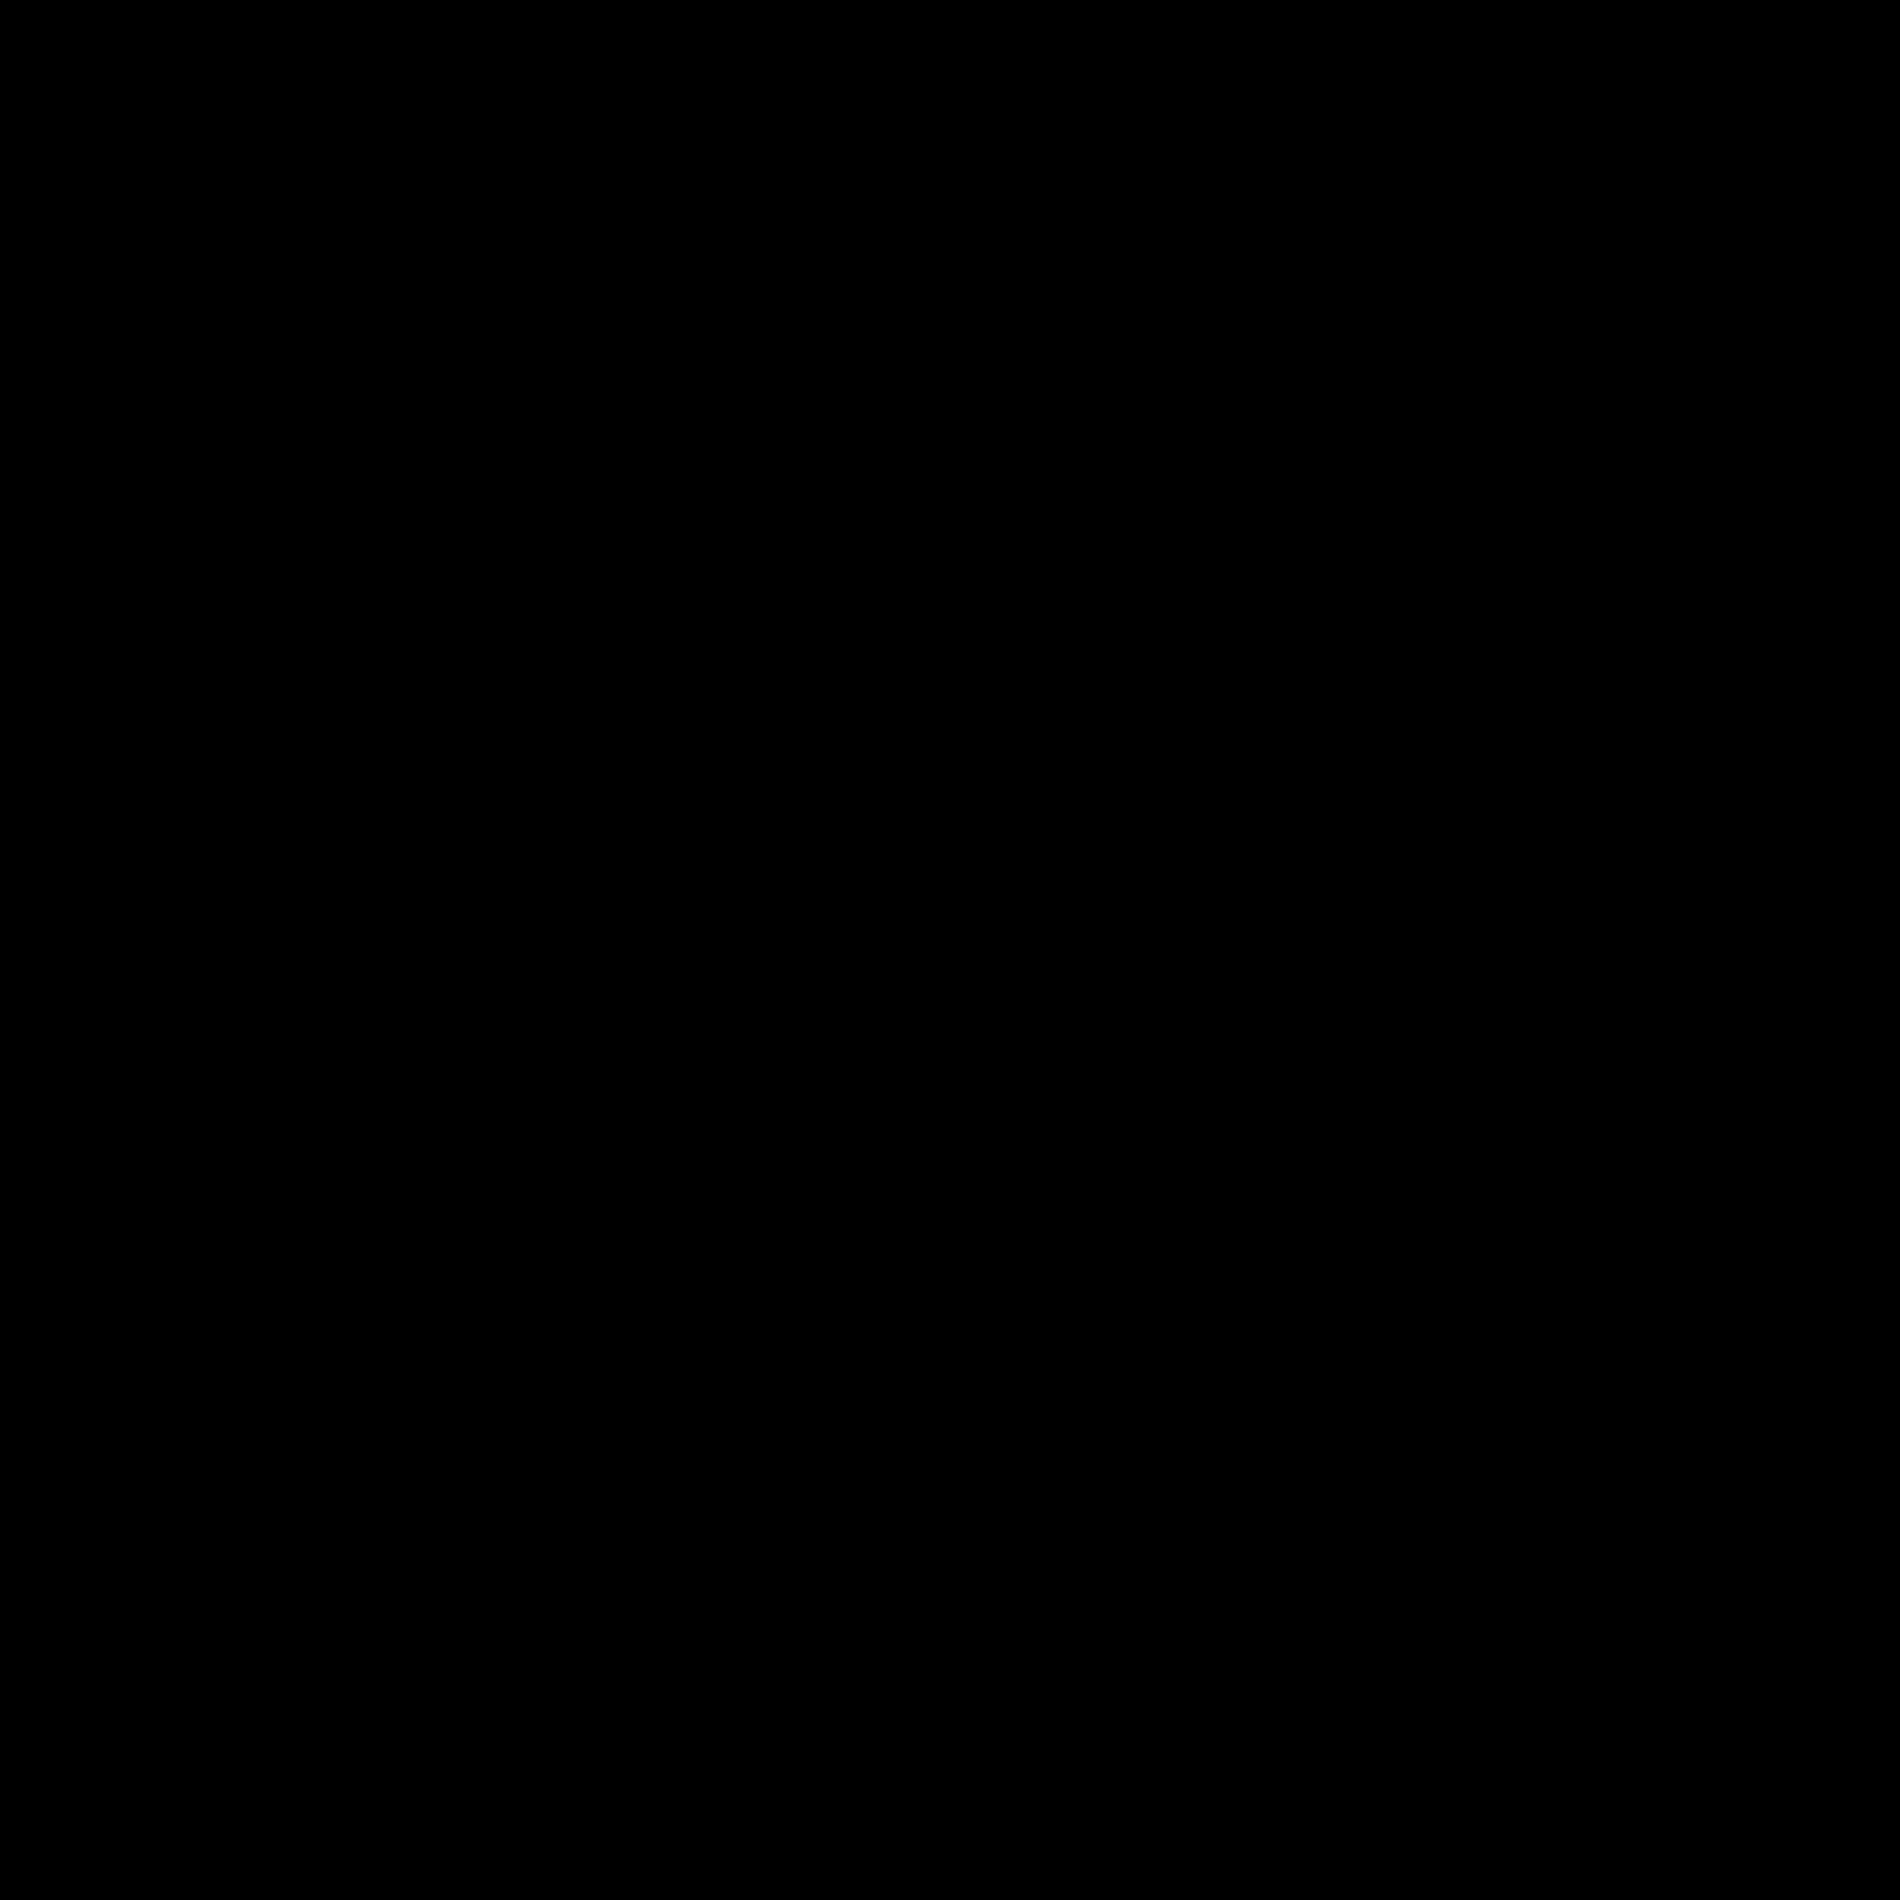 Cross clip art silhouette. At getdrawings com free